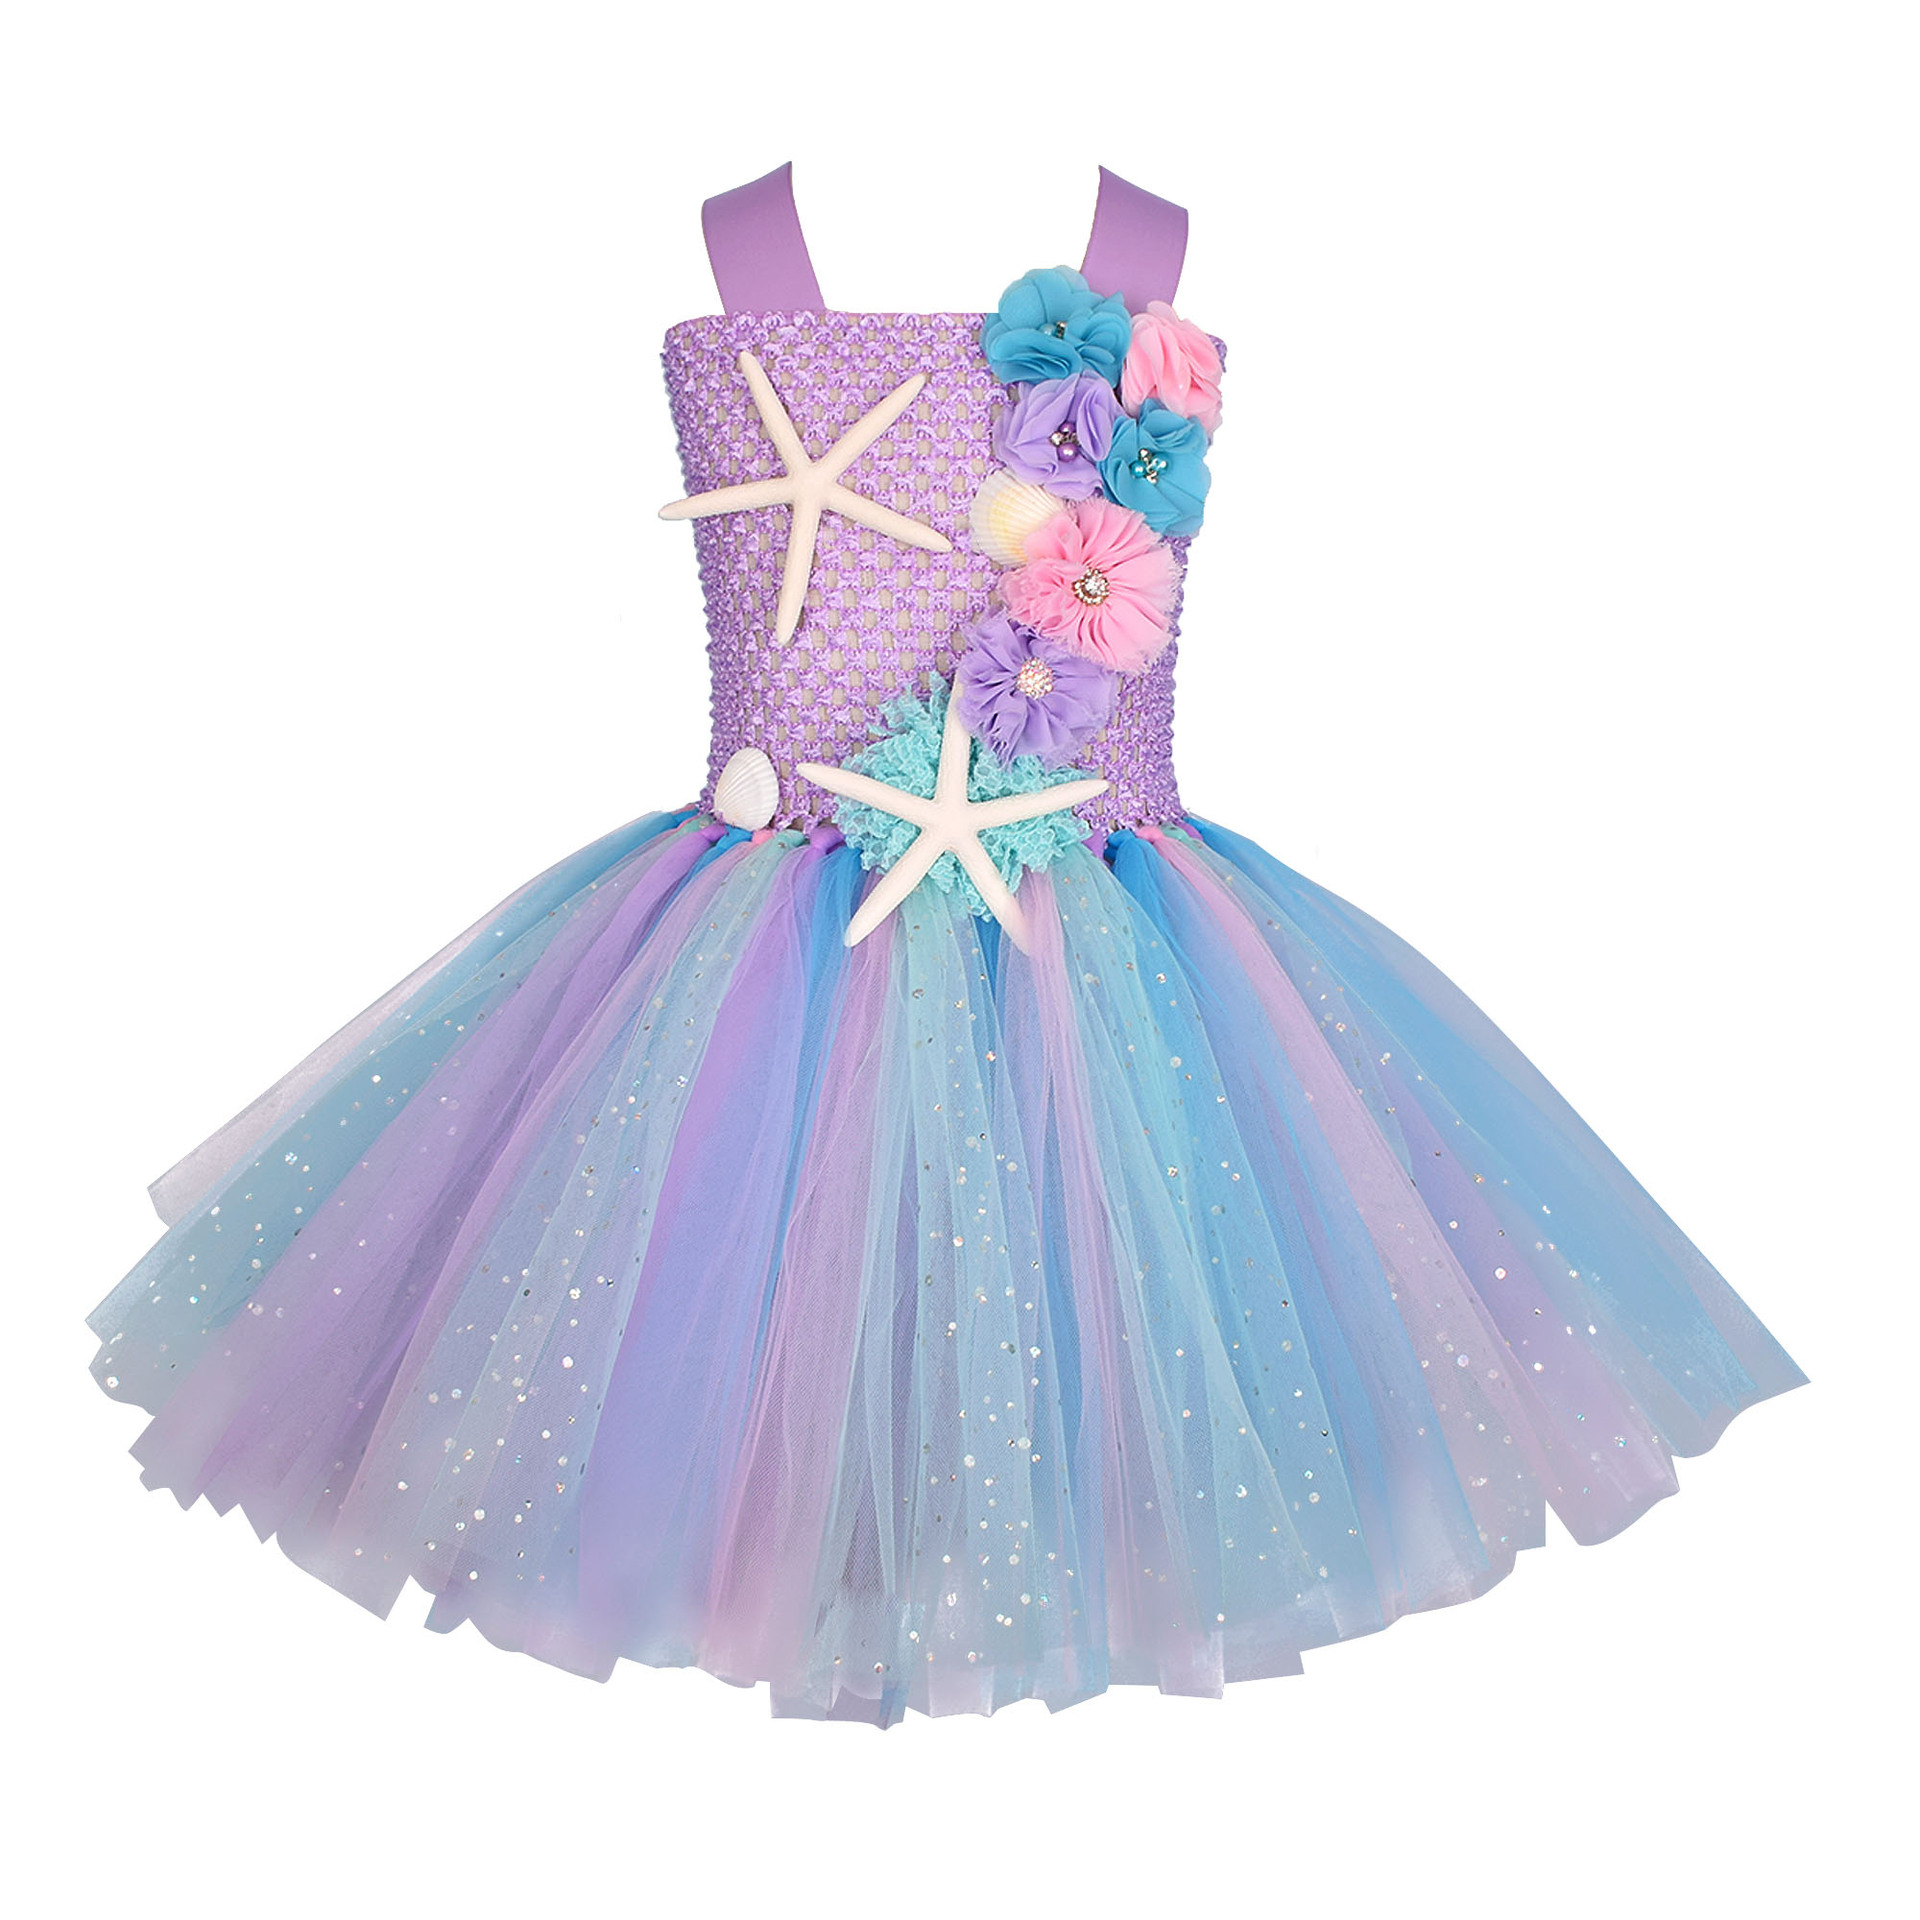 Girls Pastel Mermaid Tutu Dress Under the Sea Theme Birthday Party Costume with Flower Headband Ocean Flower Dresses 1-12Y 3